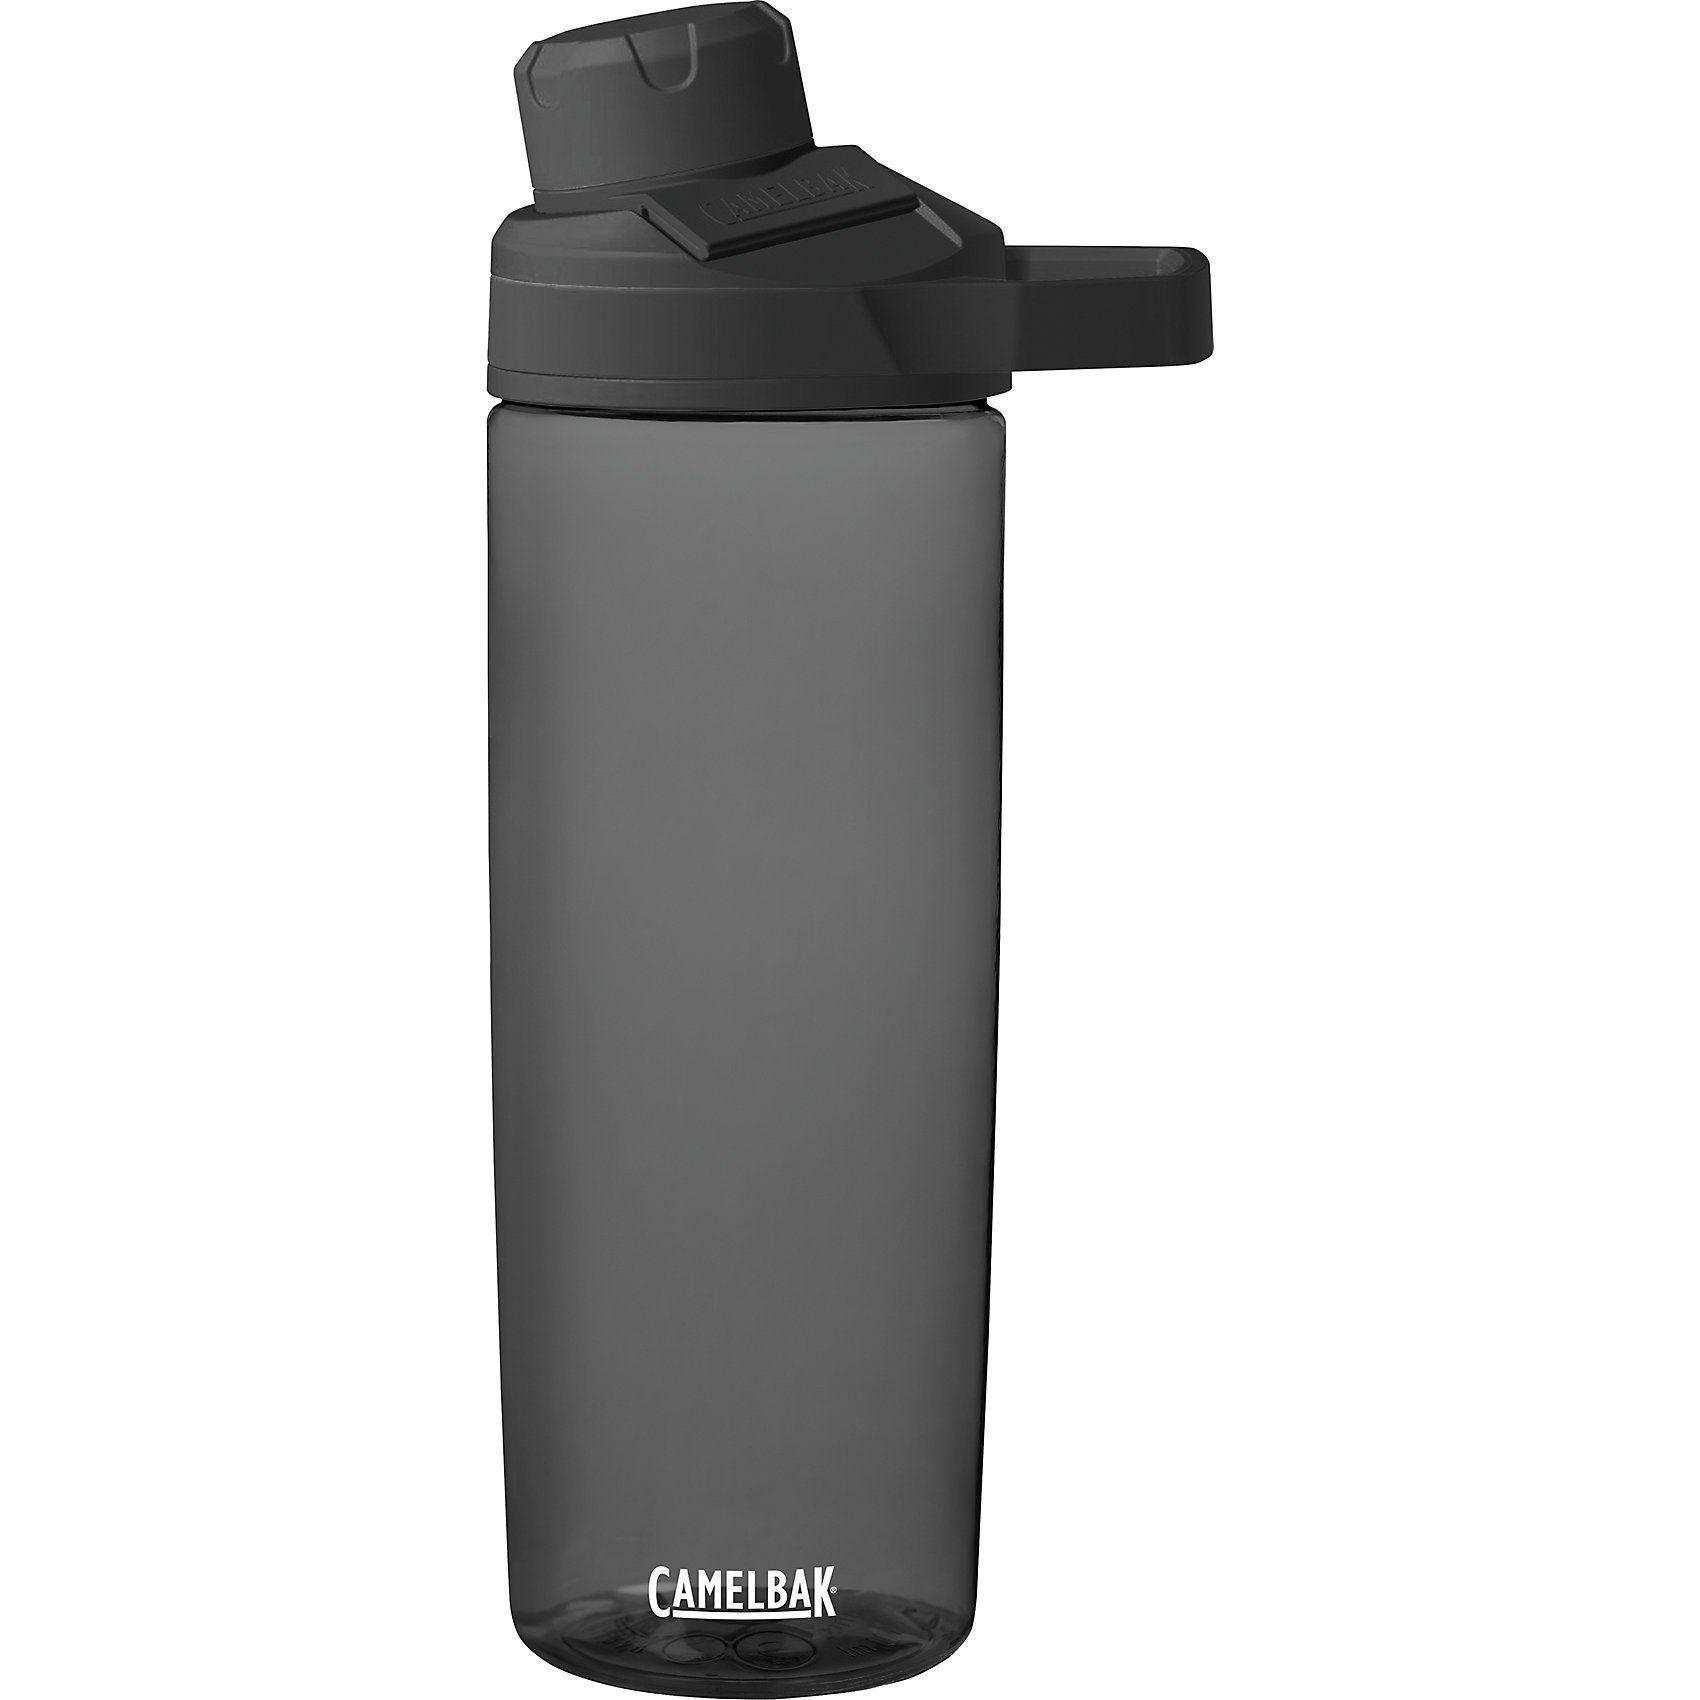 Camelbak Trinkflasche CHUTE Charcoal, 600 ml